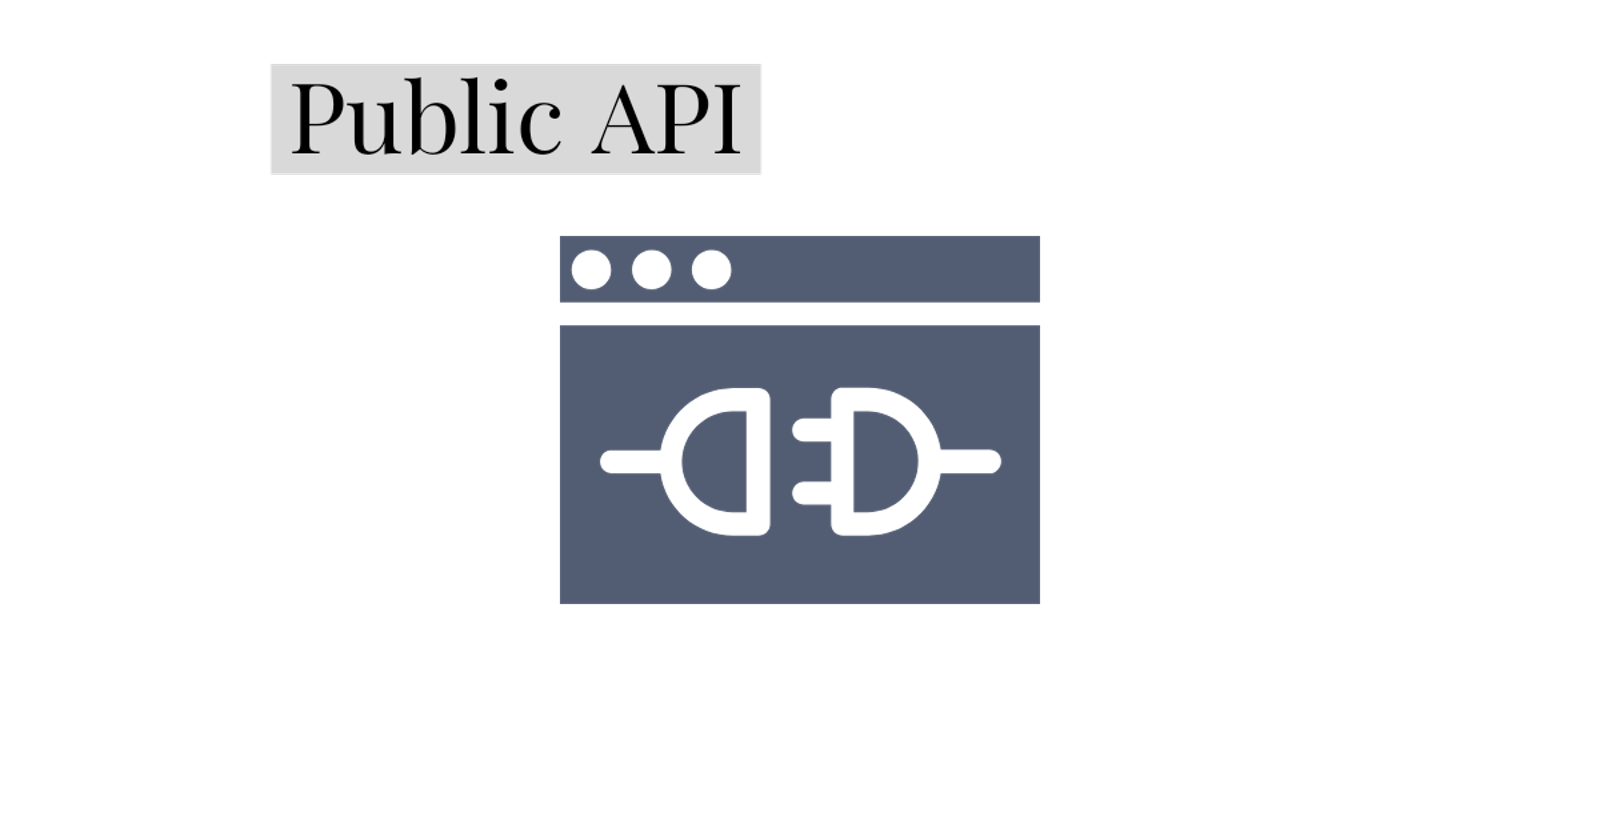 How to use Public API's